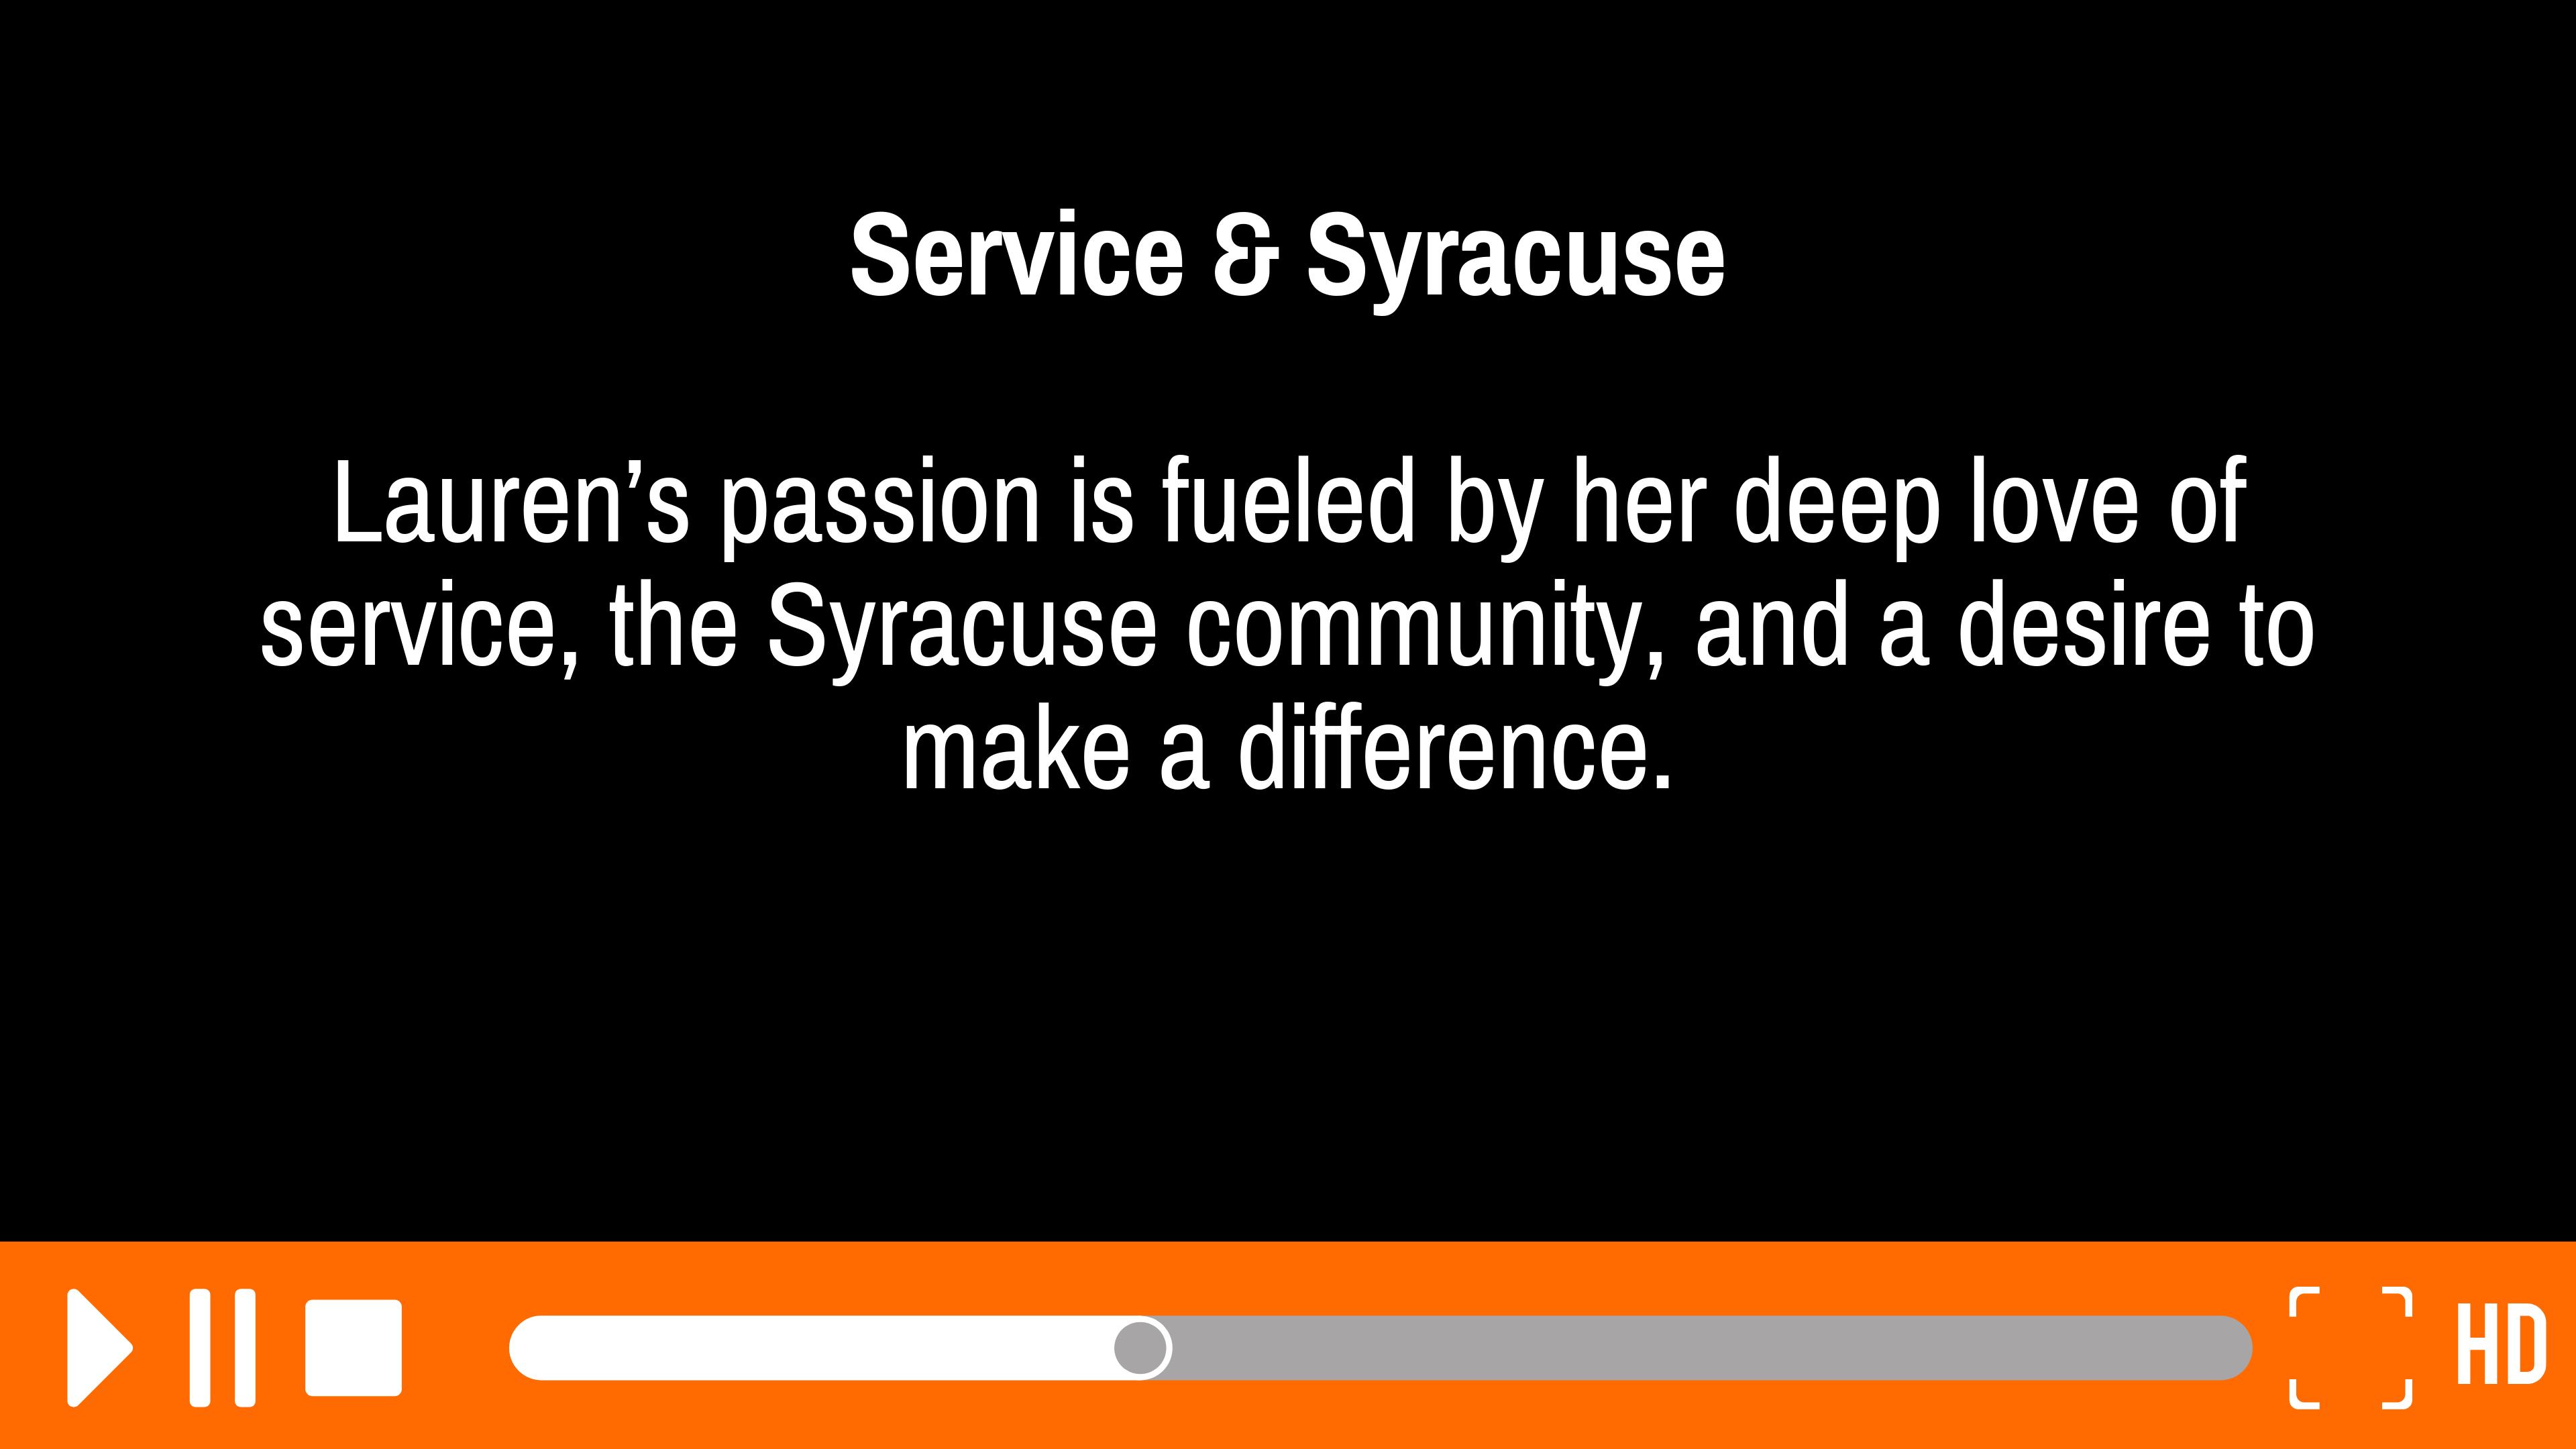 Service & Syracuse: Segment 1 of 6